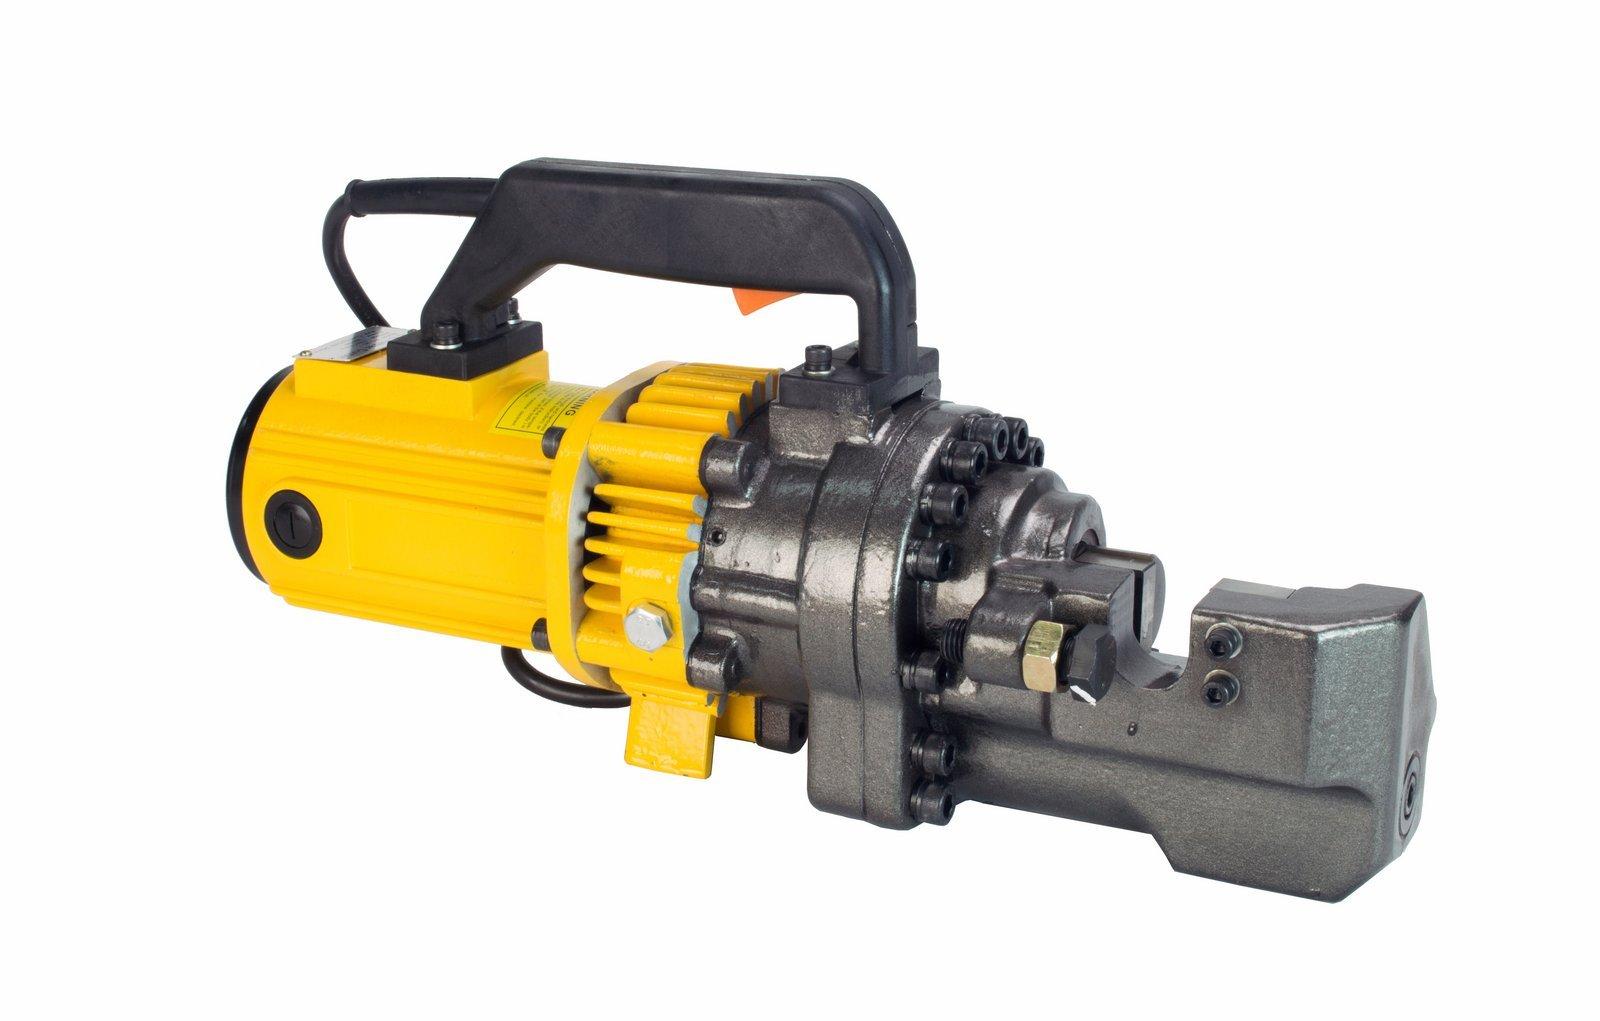 Steel Dragon Tools RBC08 1'' #8 Electric Hydraulic Rebar Cutter 2000 watt Motor